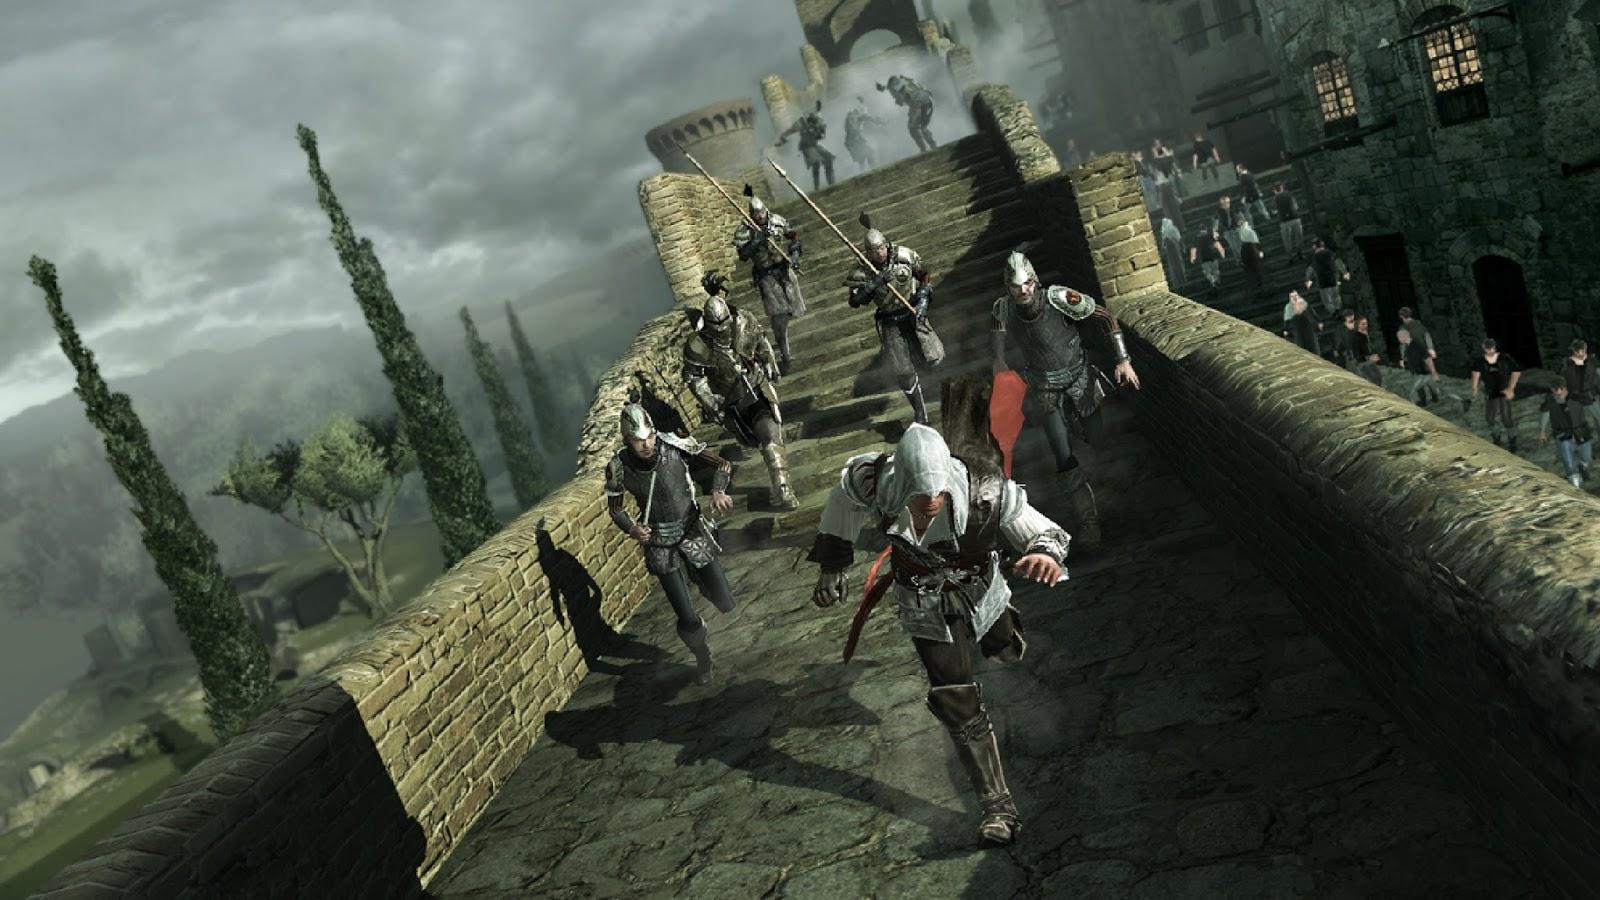 Assassin creed brotherhood skidrow download free pc « skidrow.